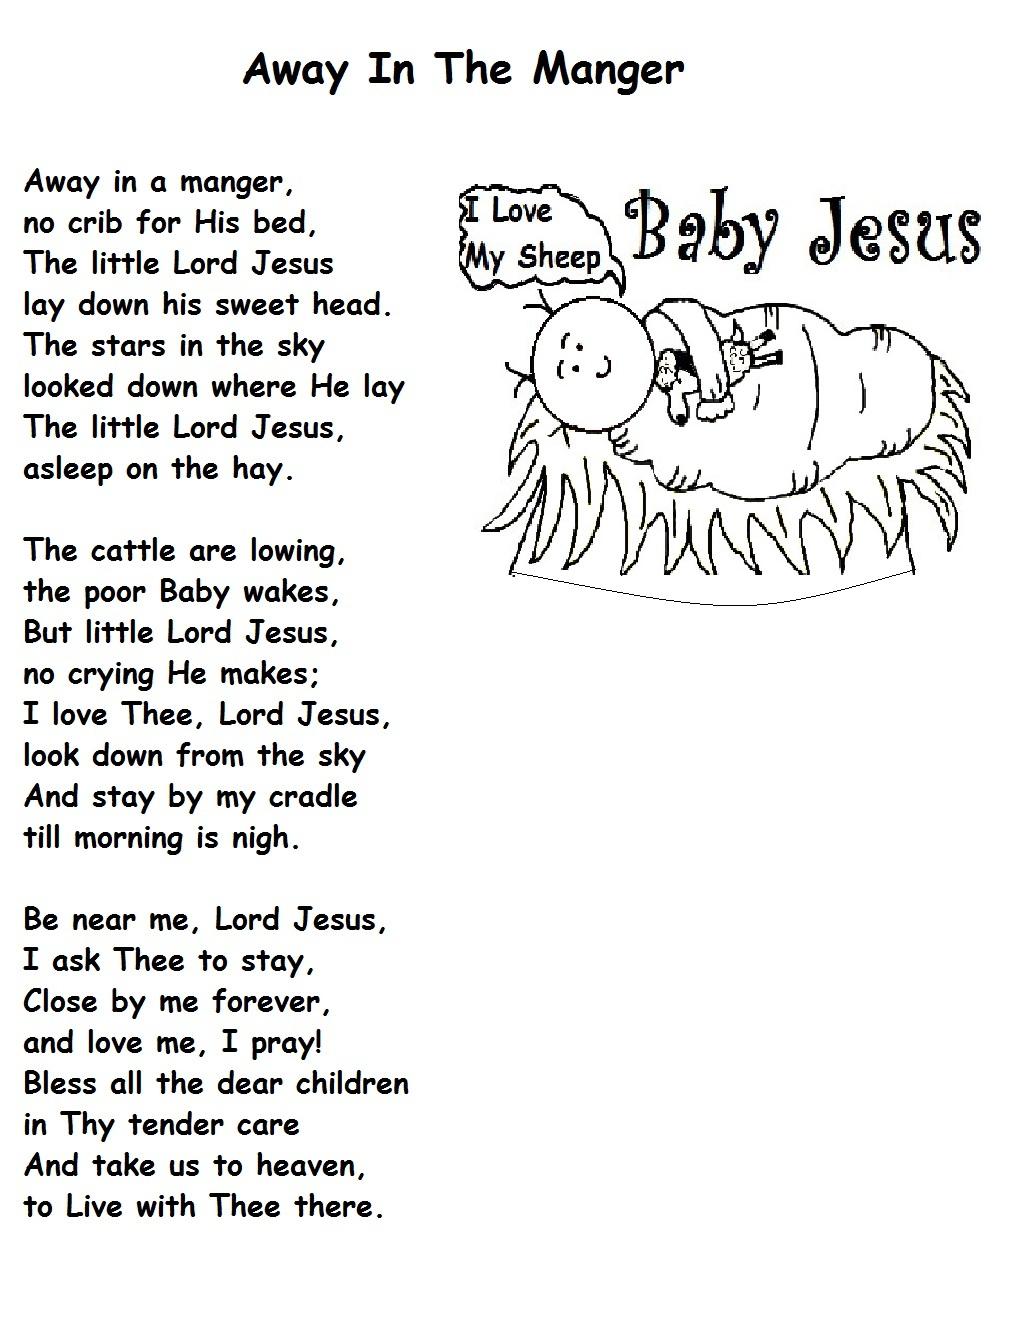 Baby Jesus Baby Jesus I Love You Lyrics : jesus, lyrics, Manger